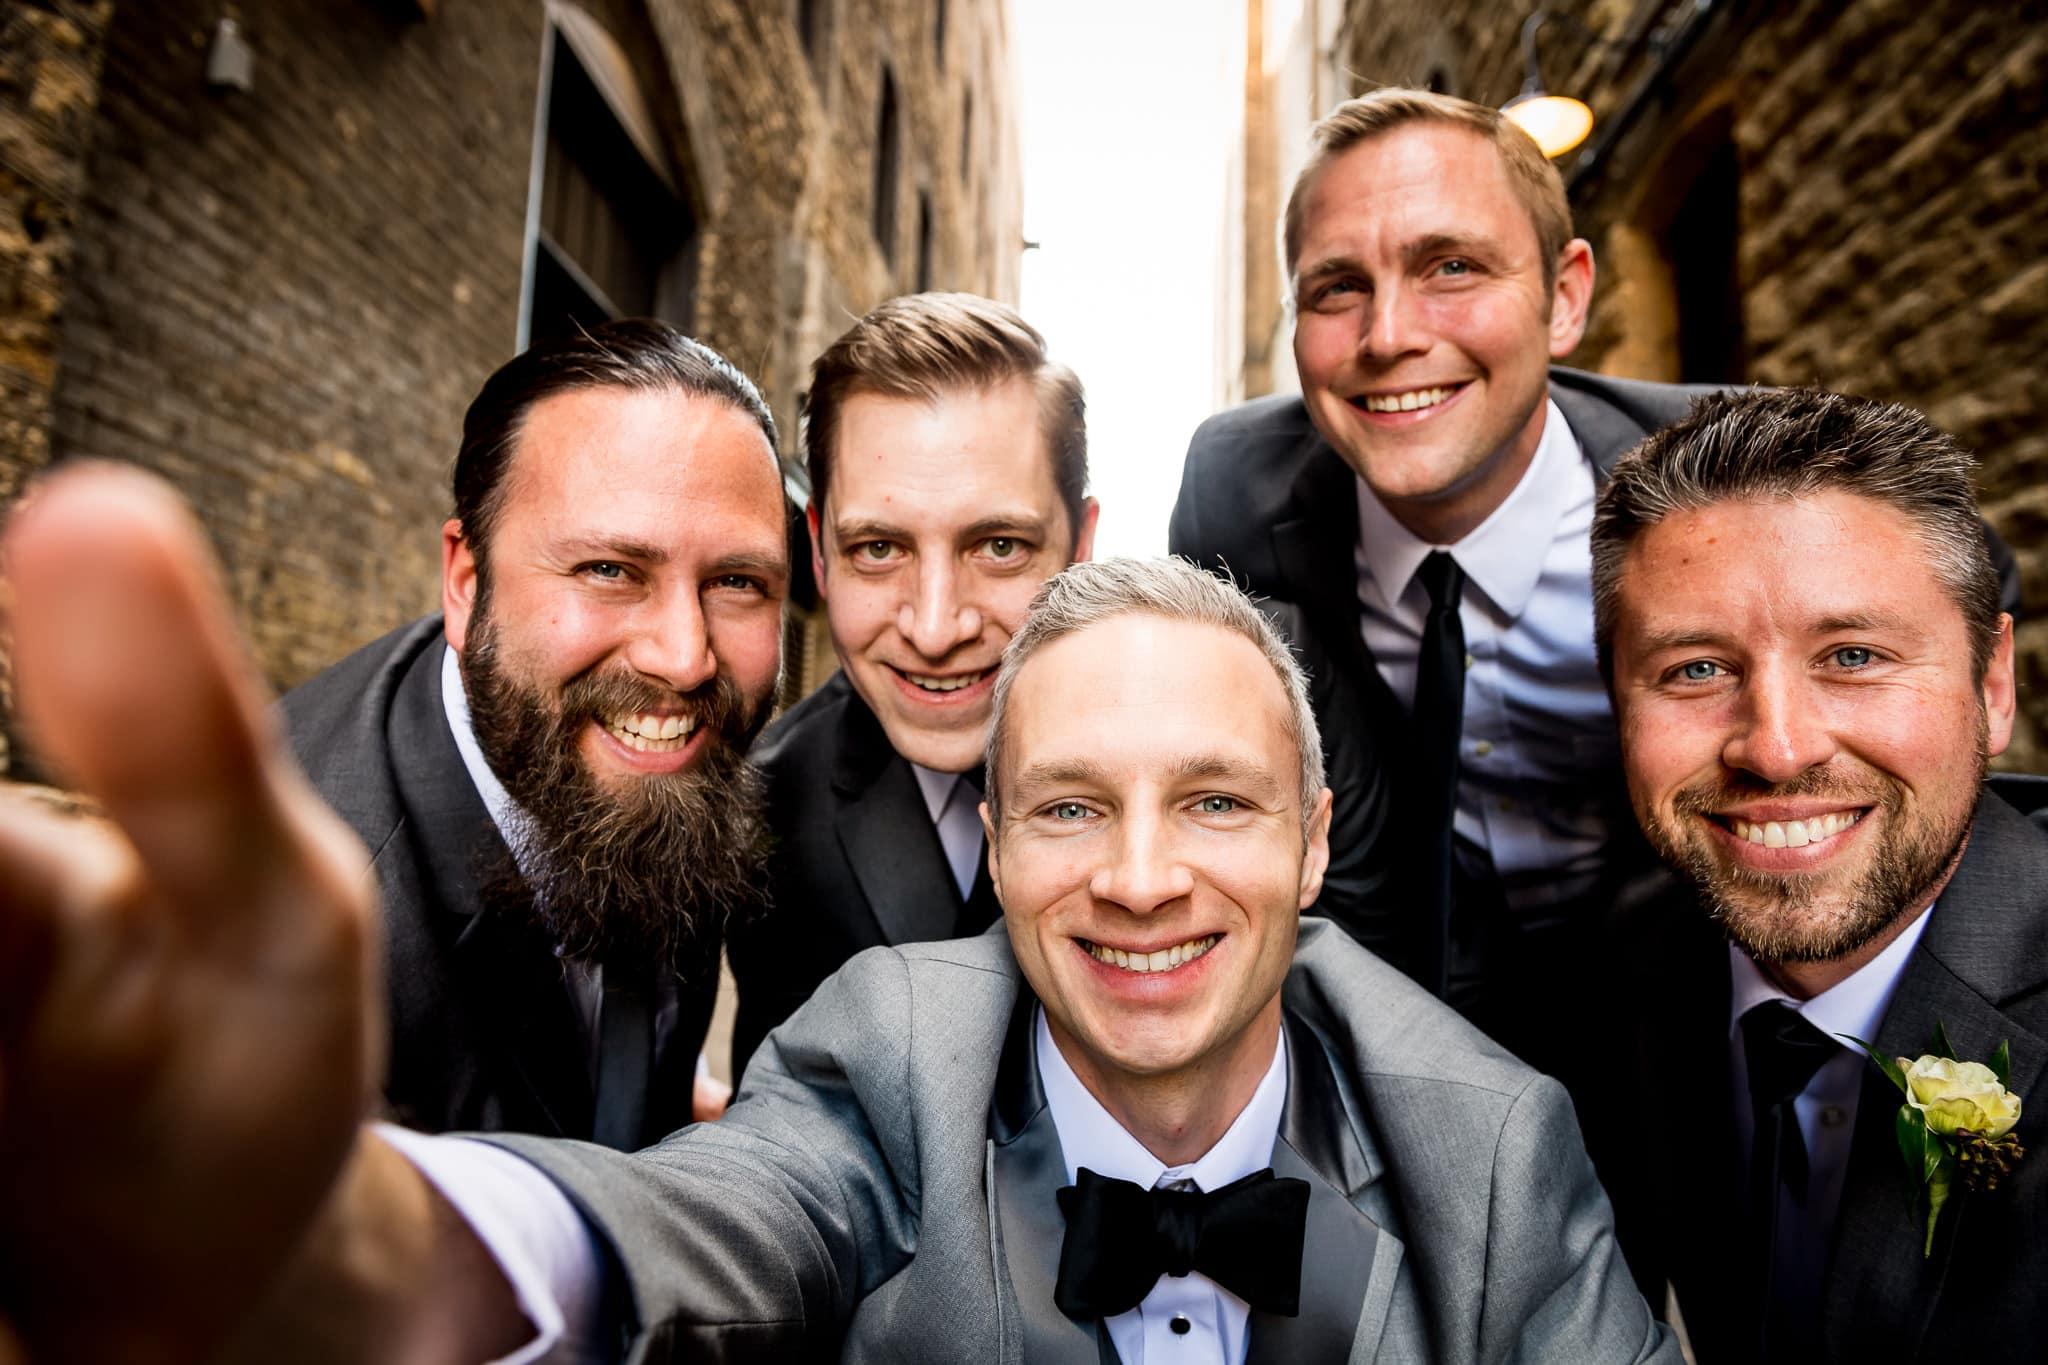 Hi-definition Grroomsen selfie in the alley behind the Hewing Hotel